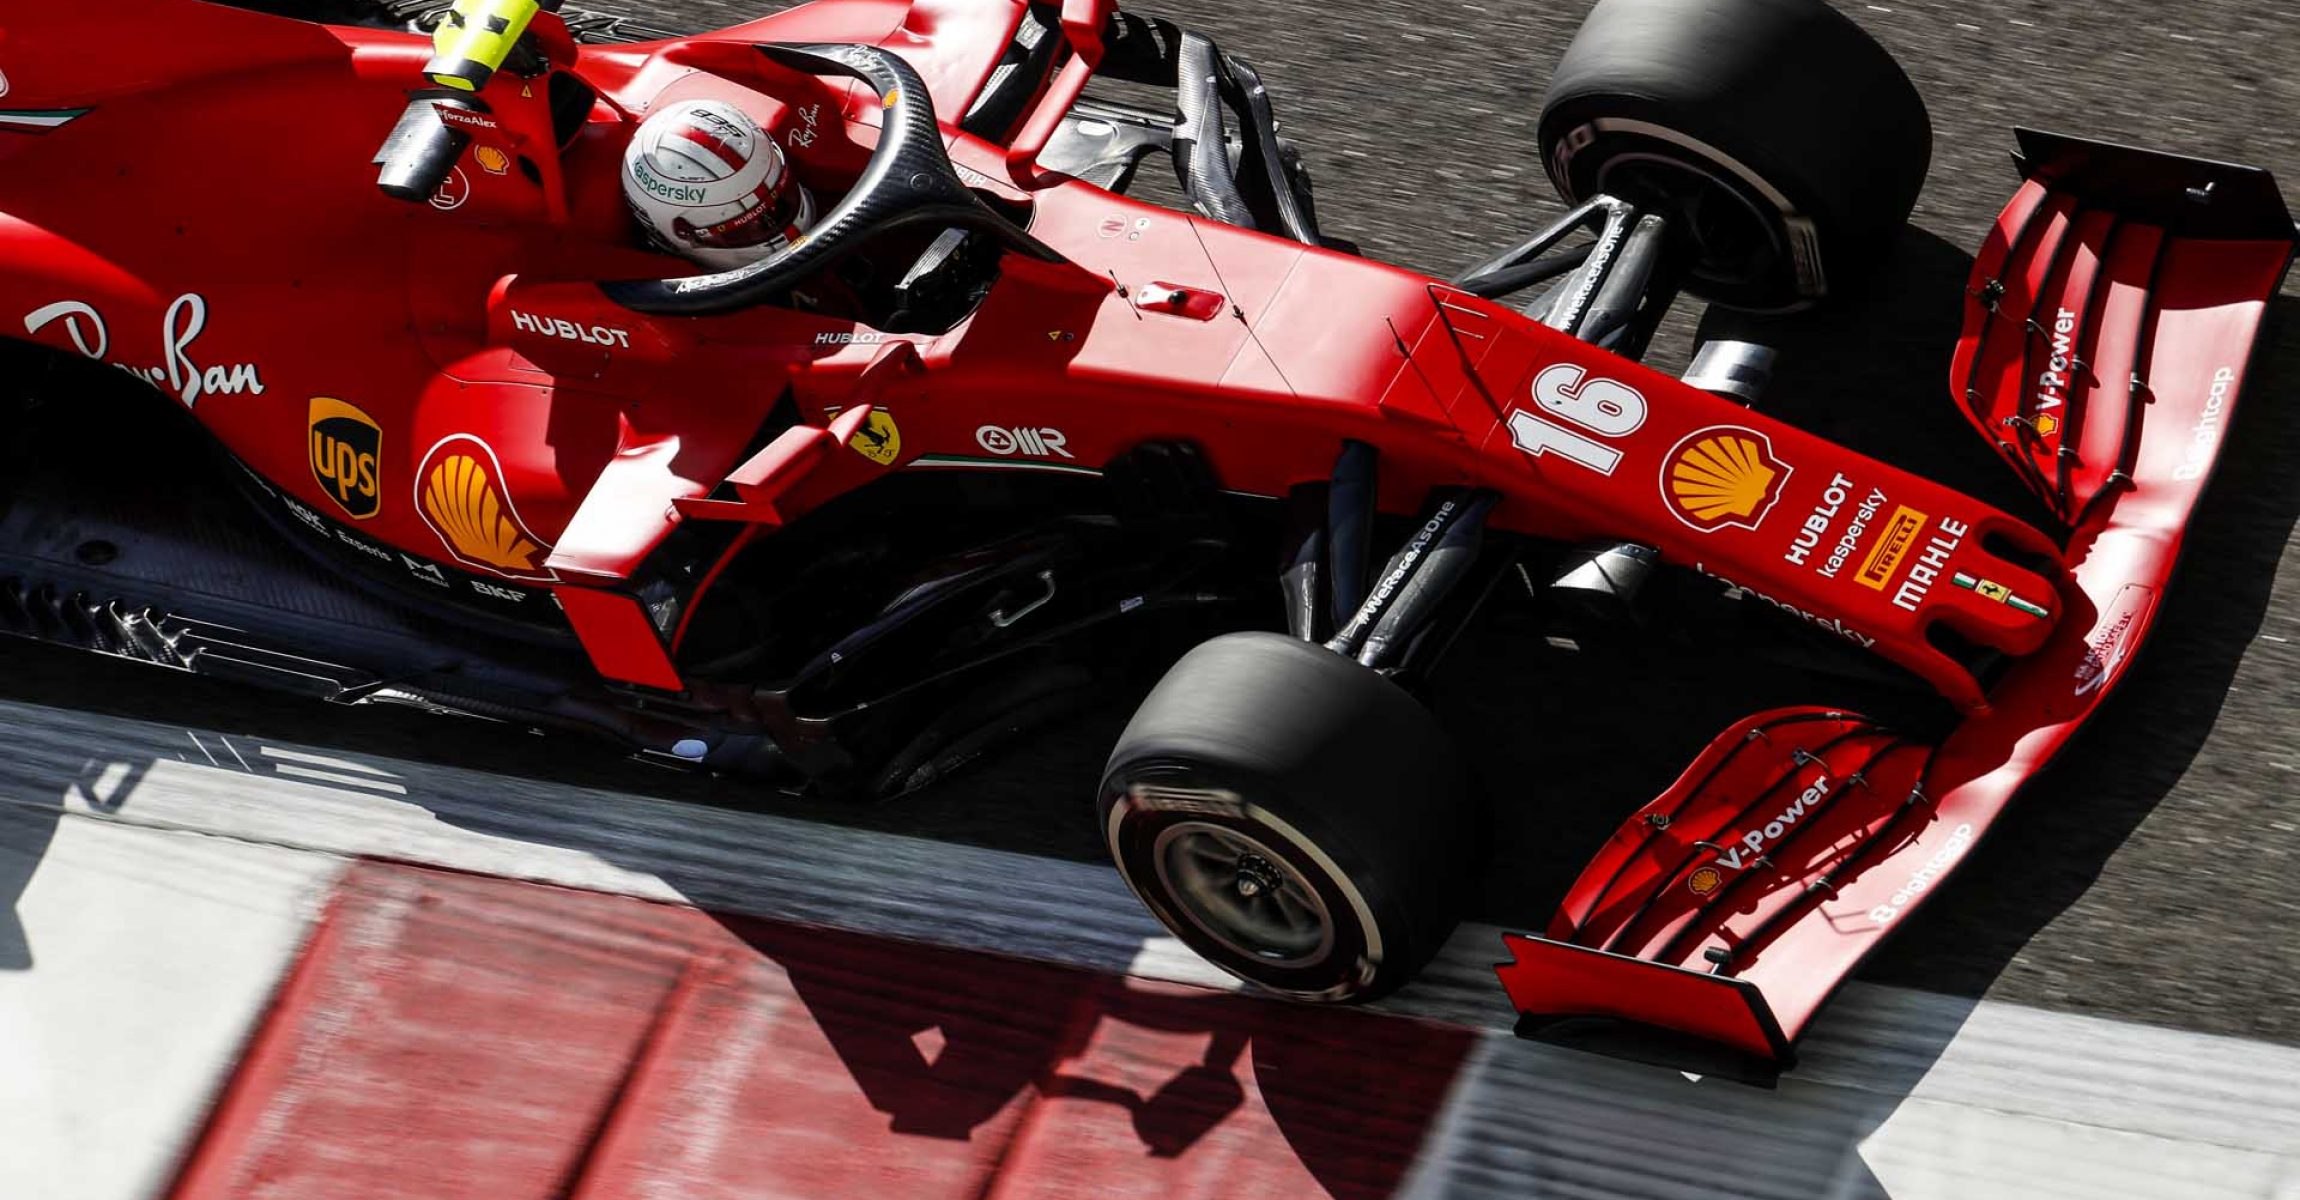 YAS MARINA CIRCUIT, UNITED ARAB EMIRATES - DECEMBER 11: Charles Leclerc, Ferrari SF1000 during the Abu Dhabi GP at Yas Marina Circuit on Friday December 11, 2020 in Abu Dhabi, United Arab Emirates. (Photo by Zak Mauger / LAT Images)